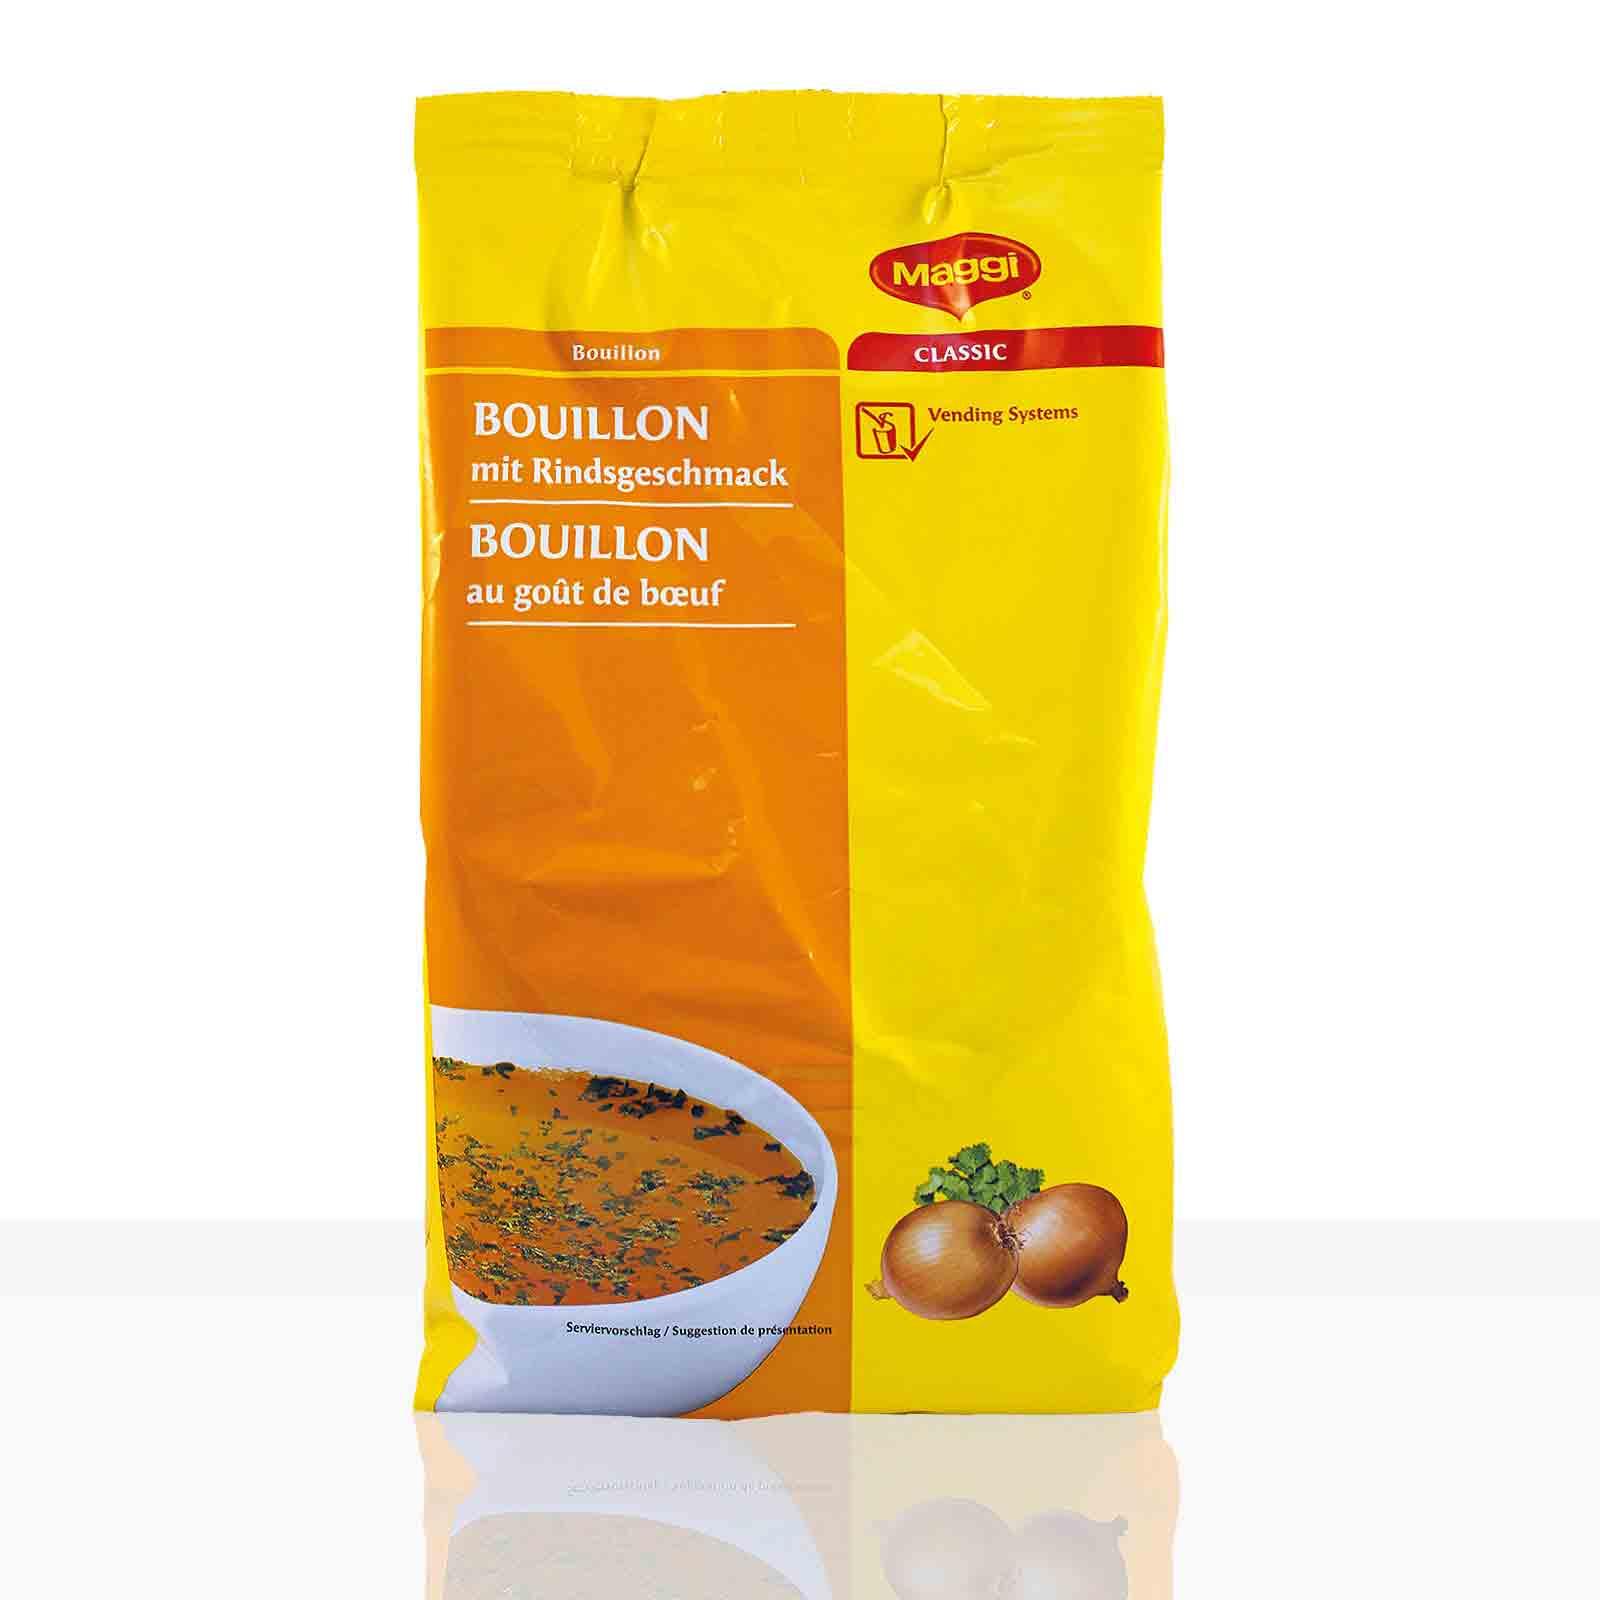 Maggi Bouillon mit Rindsgeschmack Automatensuppe 1kg Instantsuppe